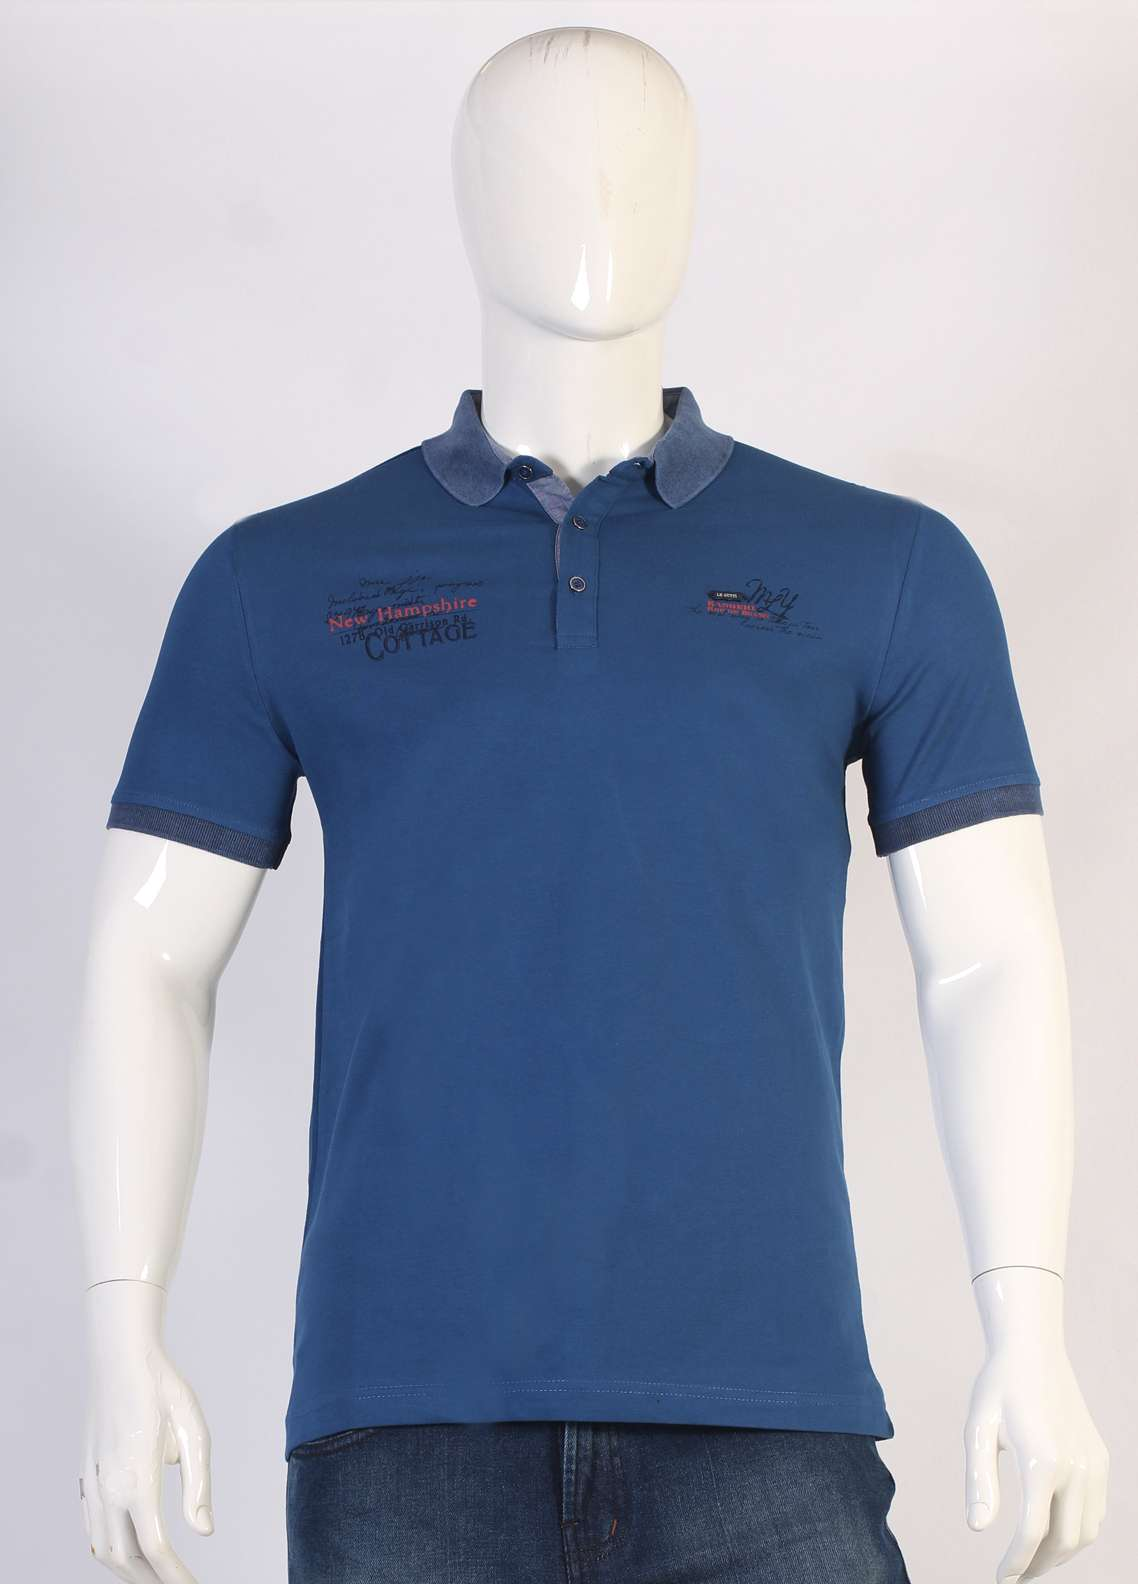 Sanaulla Exclusive Range Jersey Polo Men T-Shirts - Blue TKM18S 366-04